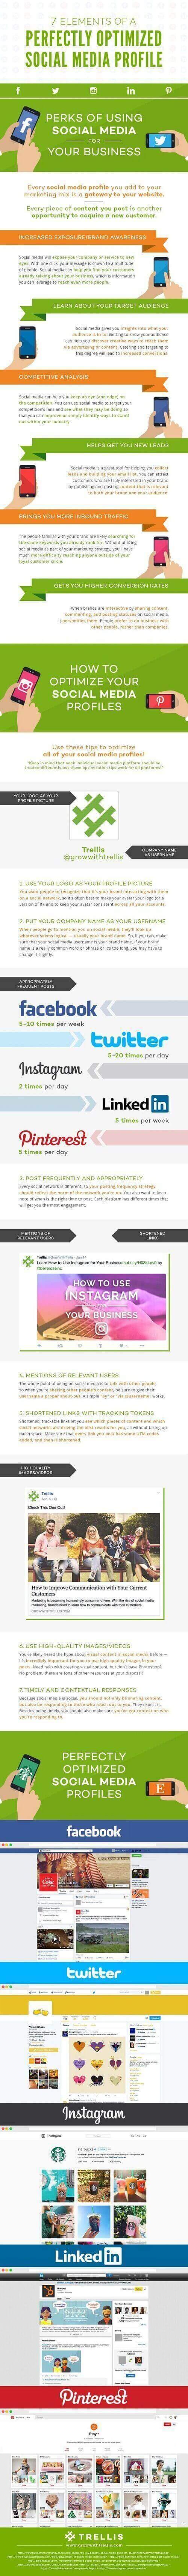 7 elementos clave para optimizar tus perfiles sociales #infografia